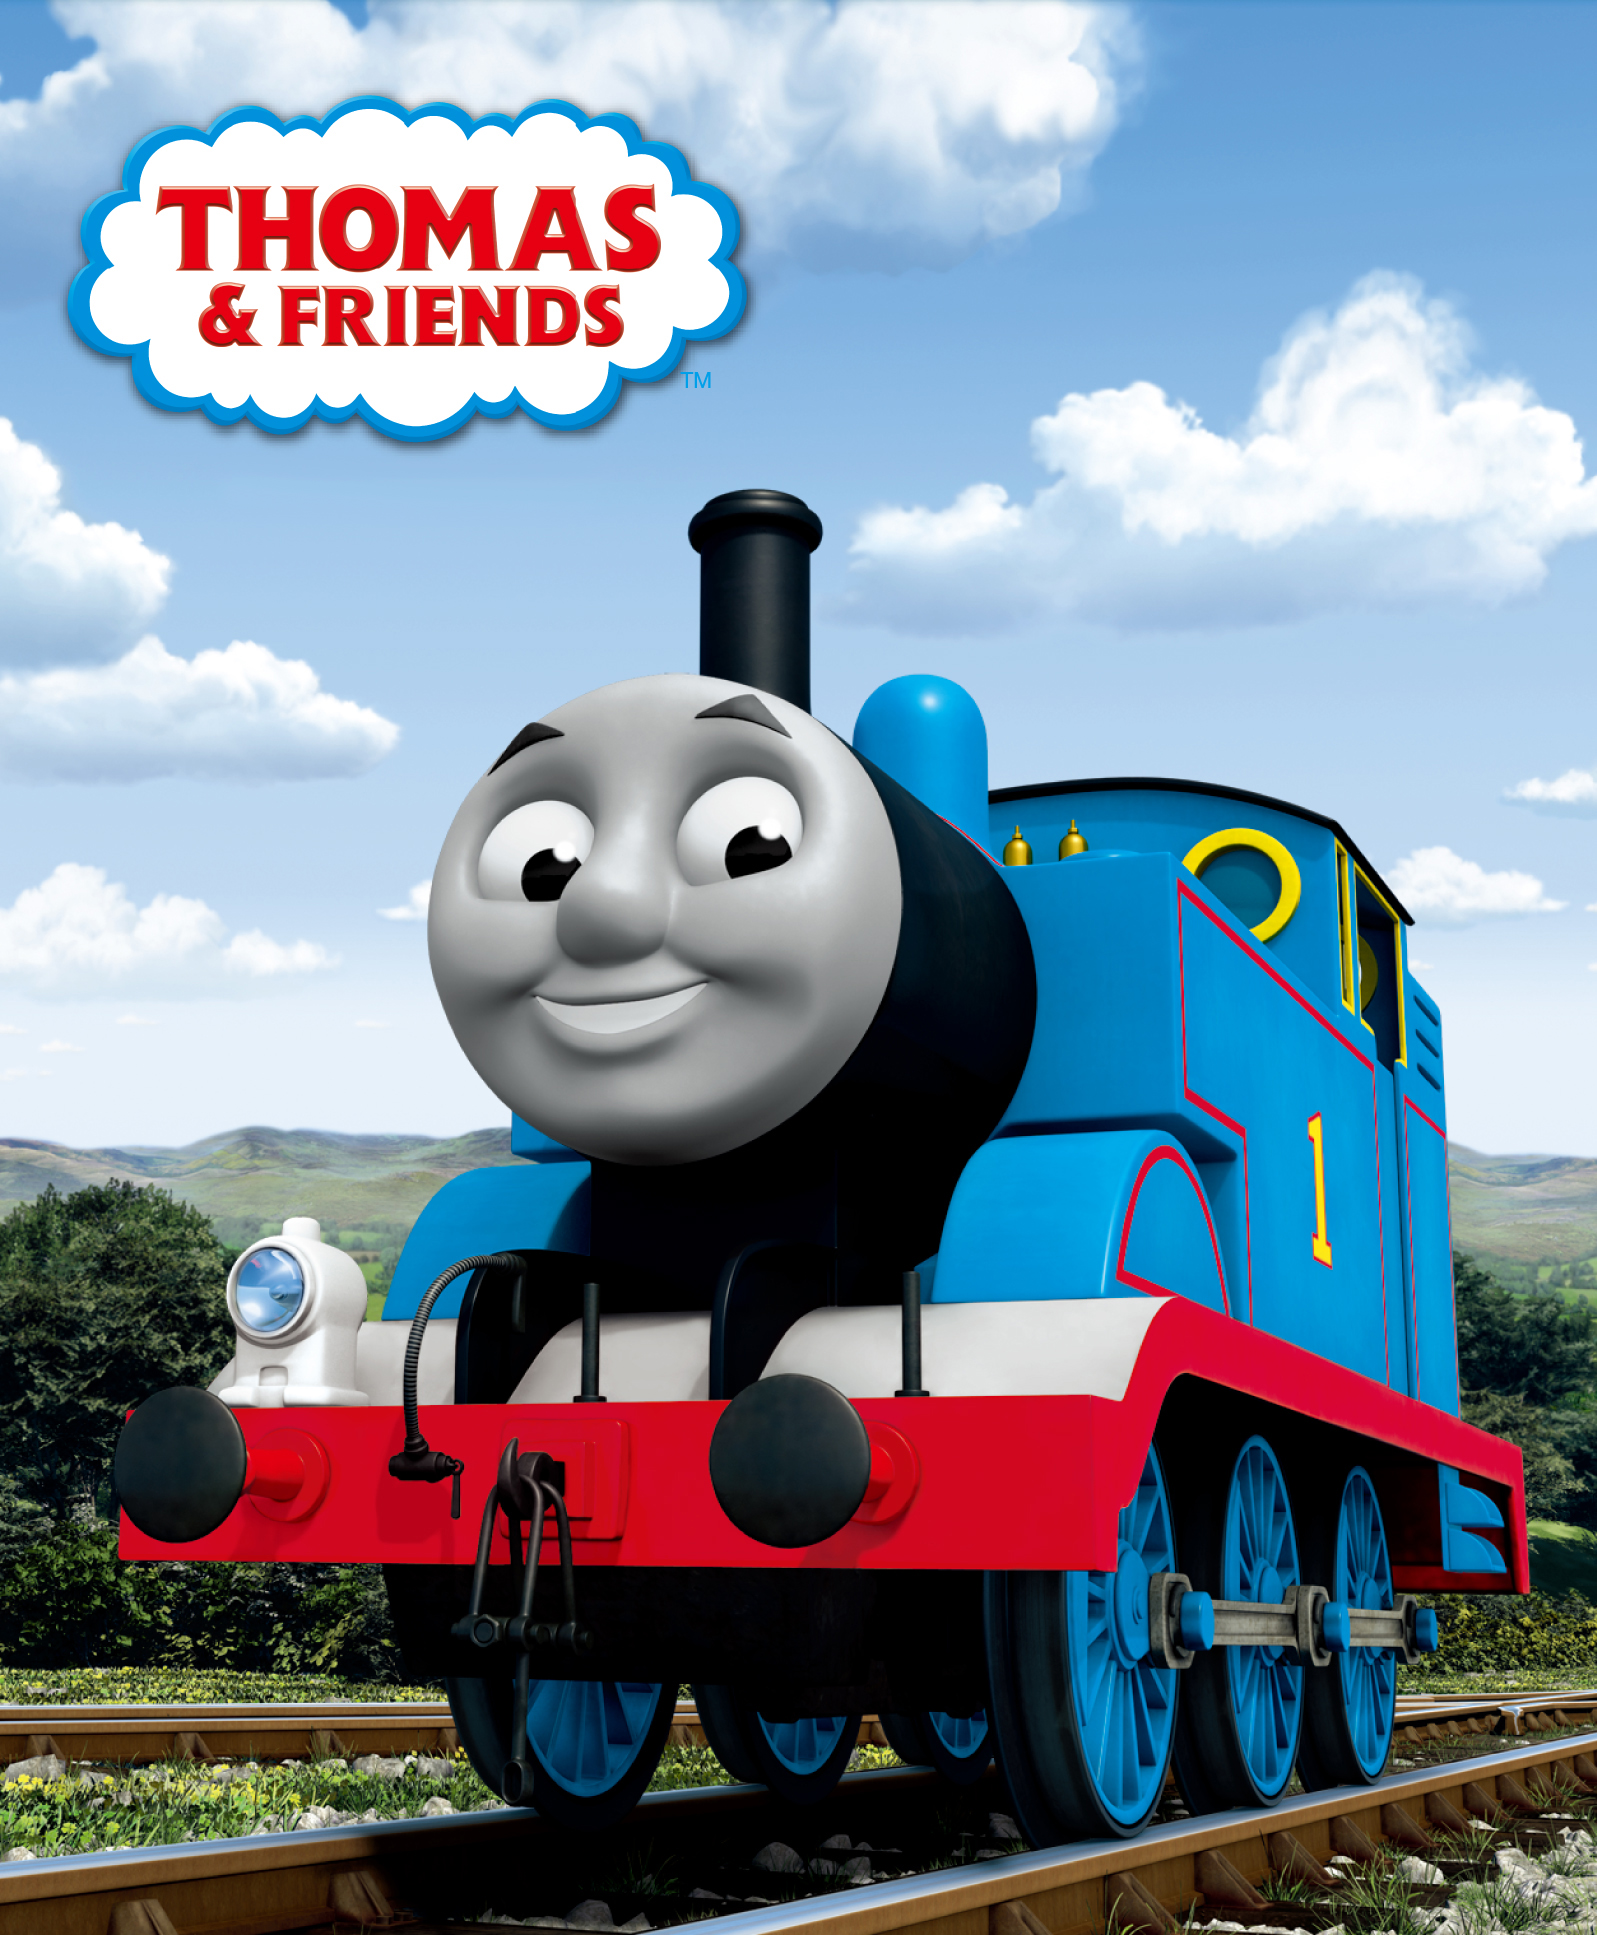 (C)2019 Gullane(Thomas)Limited. (C)2019 HIT Entertainment Limited.